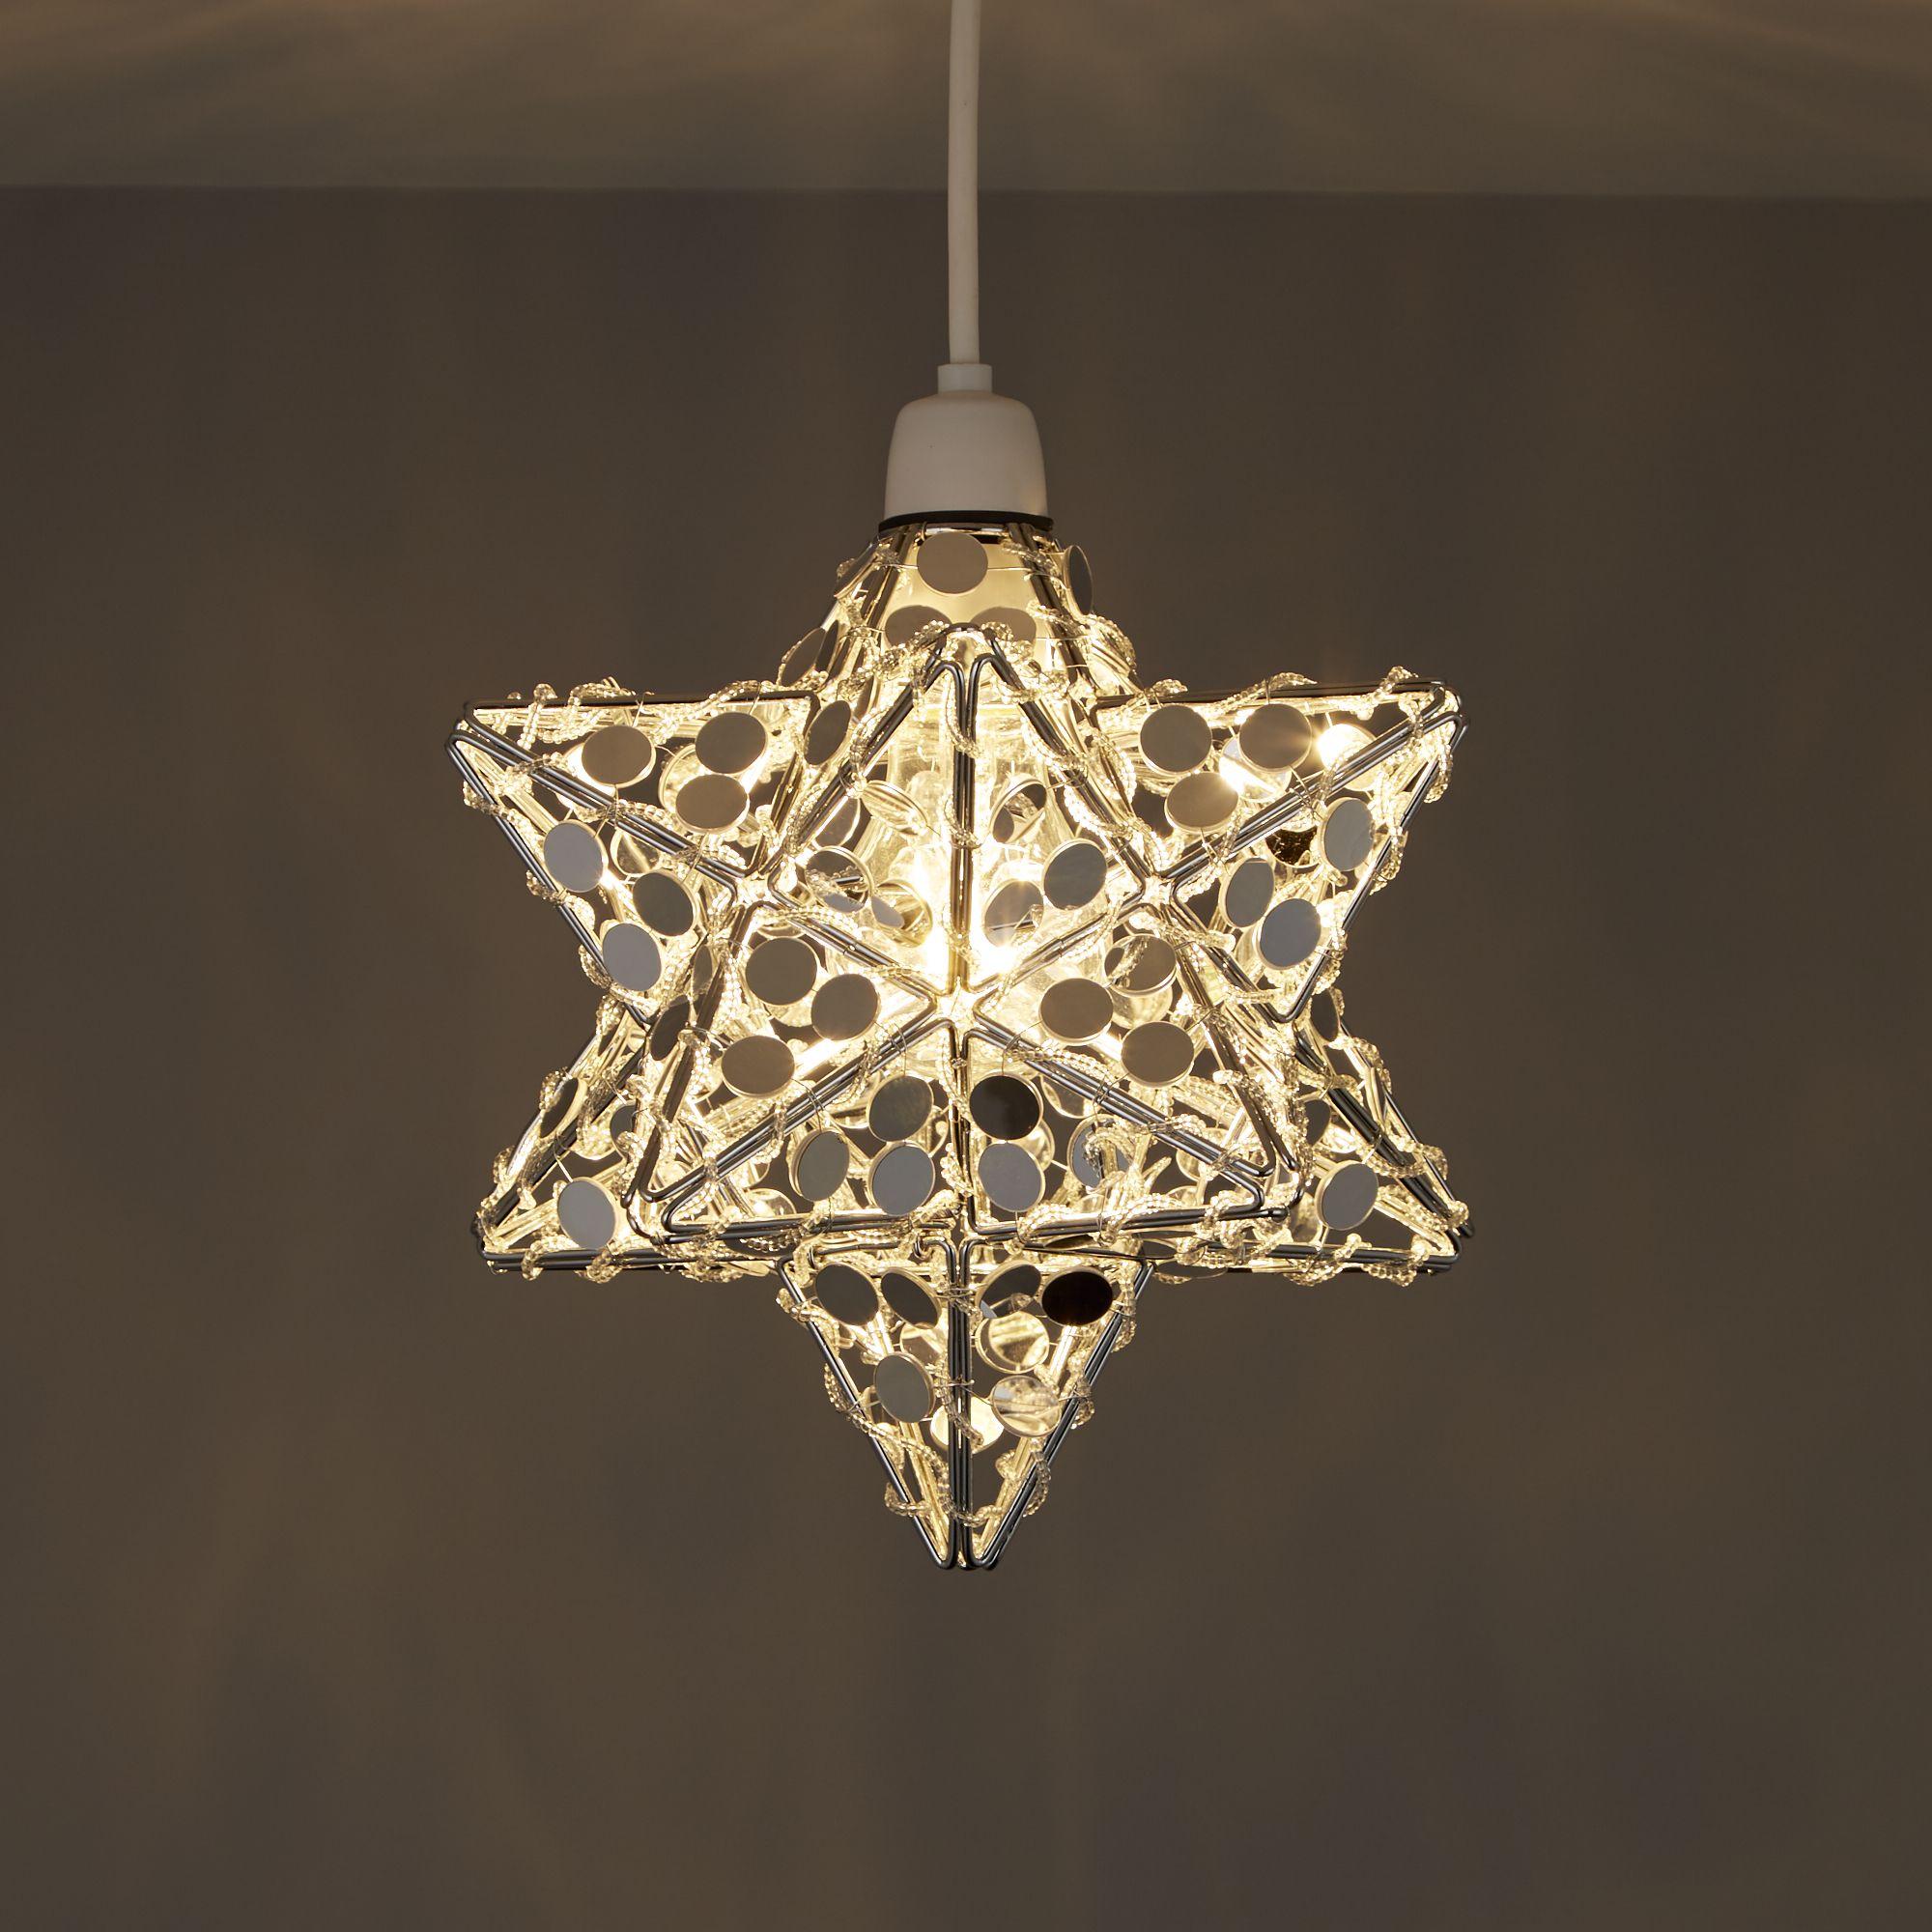 Chrome Effect Mirrored Star Ceiling Light